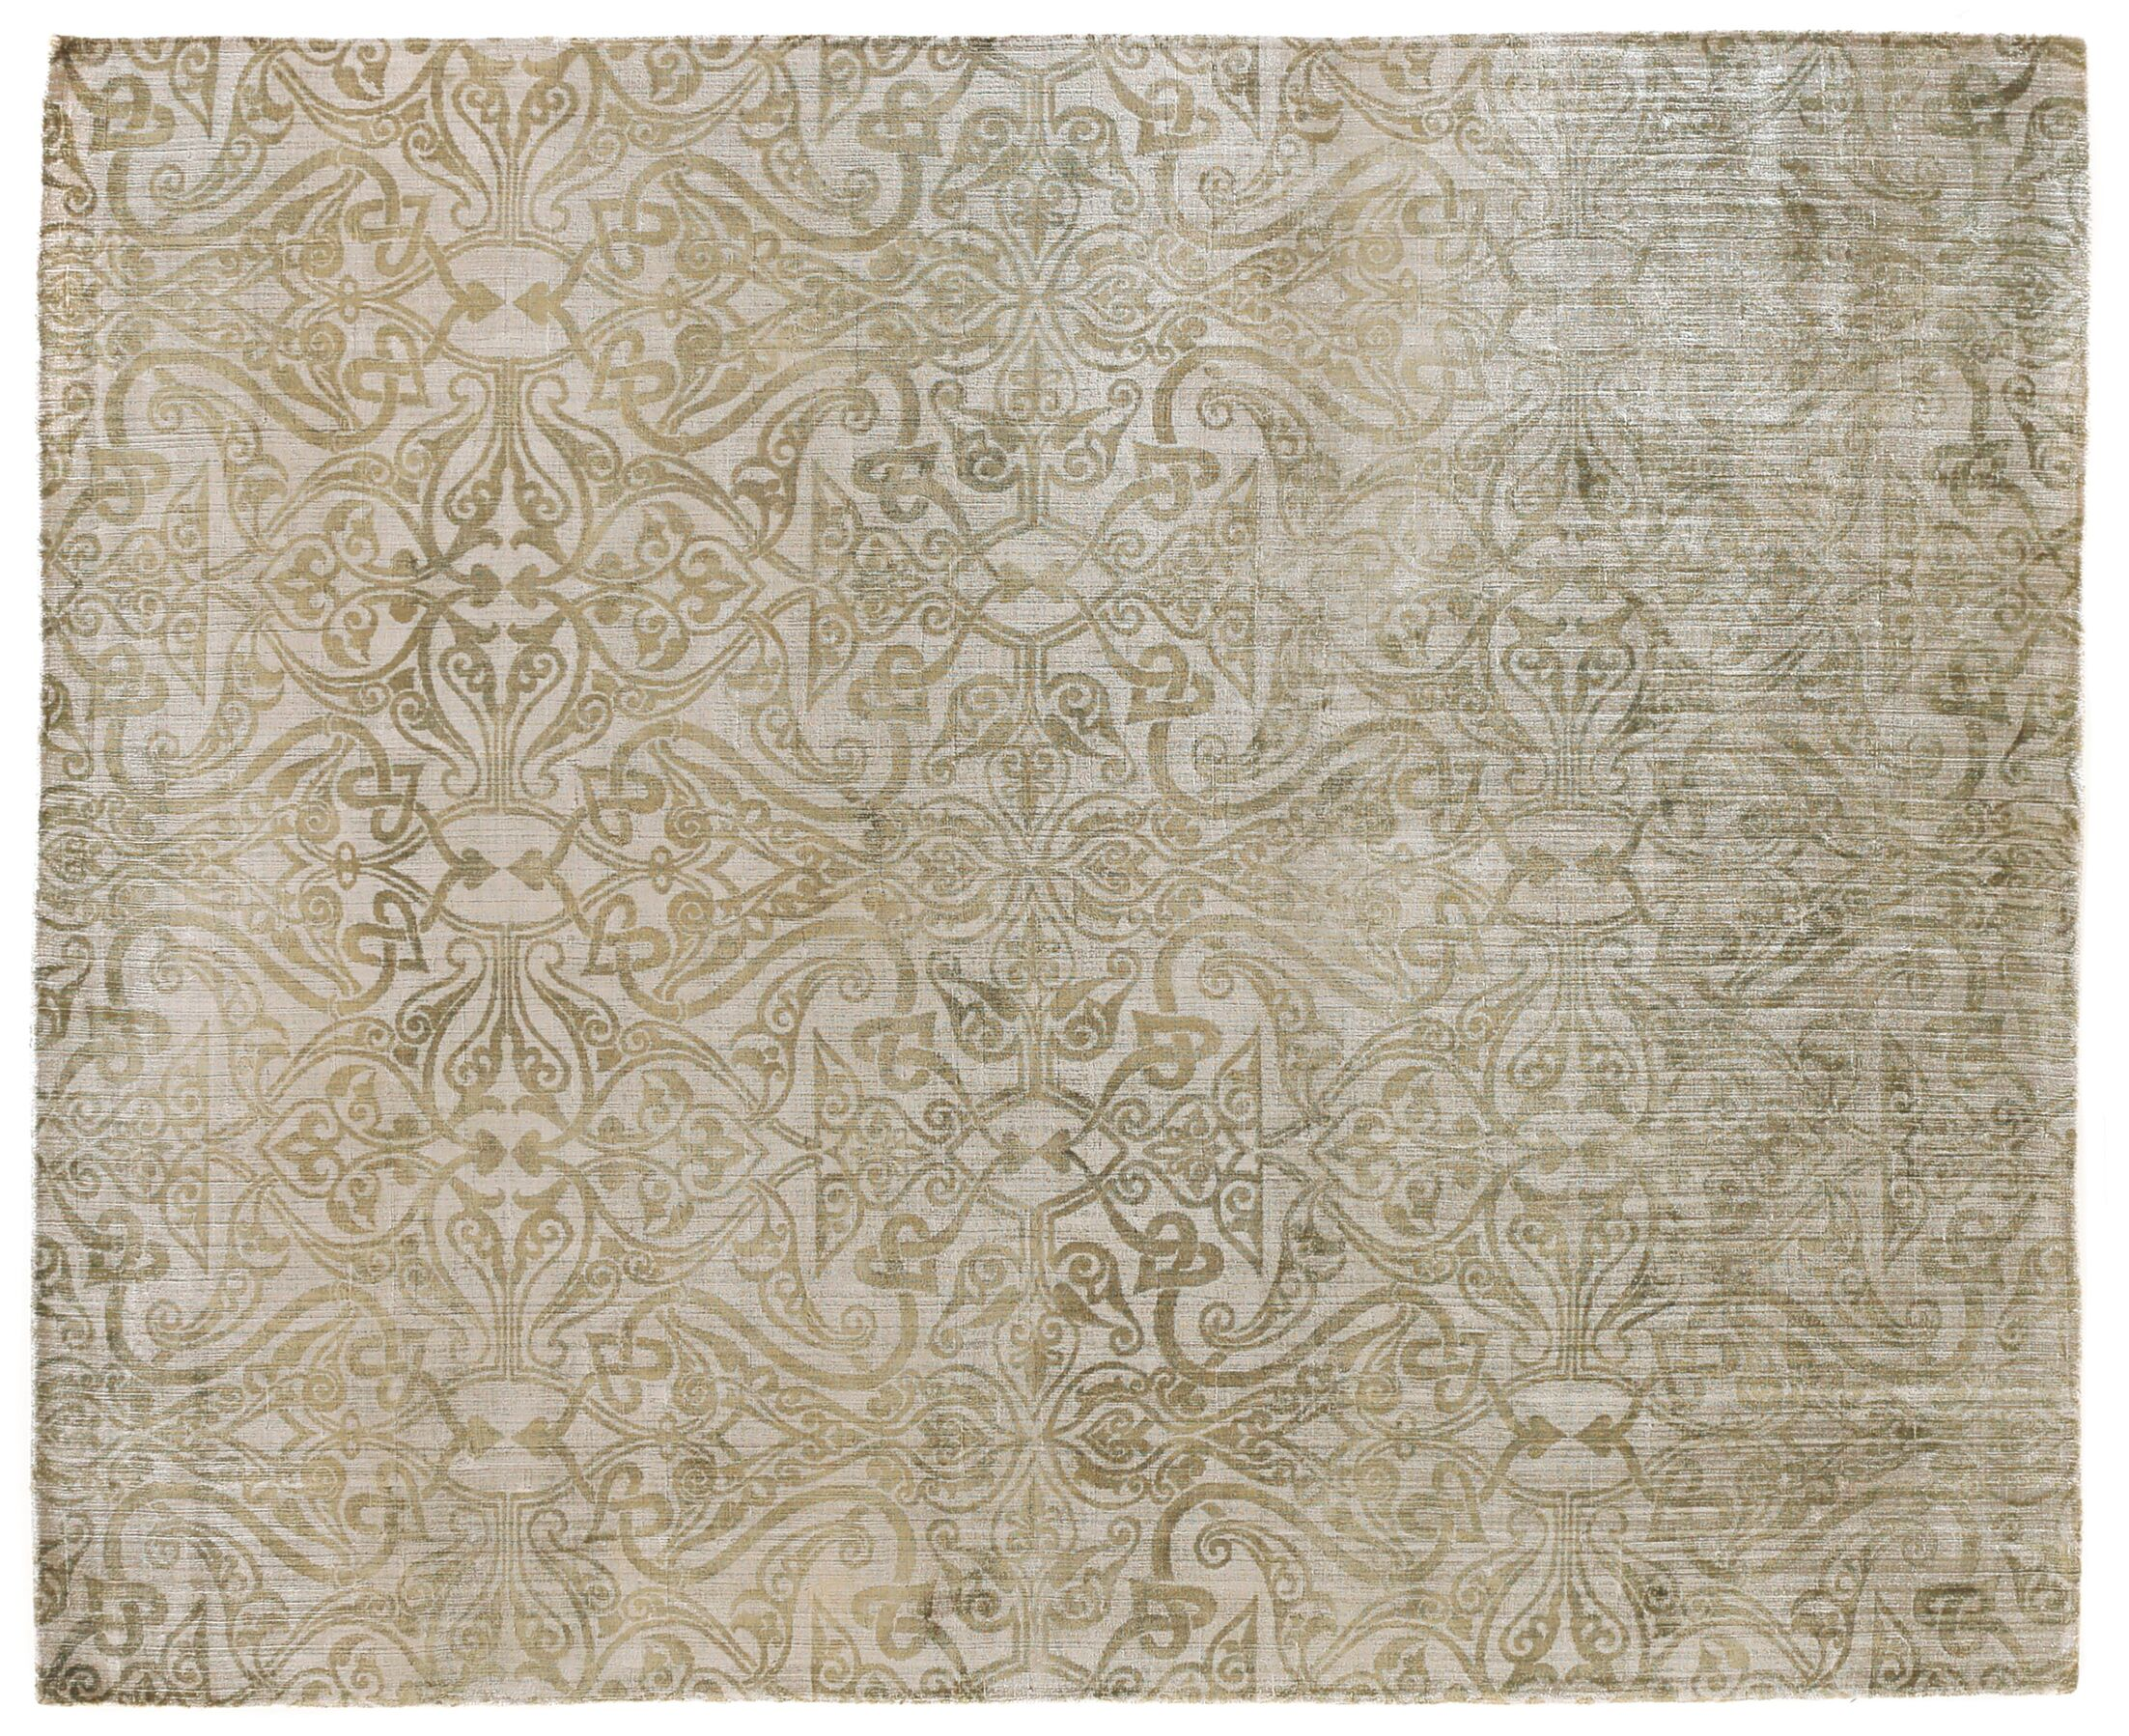 Koda Hand Woven Silk Light Beige Area Rug Rug Size: Rectangle 8' x 10'